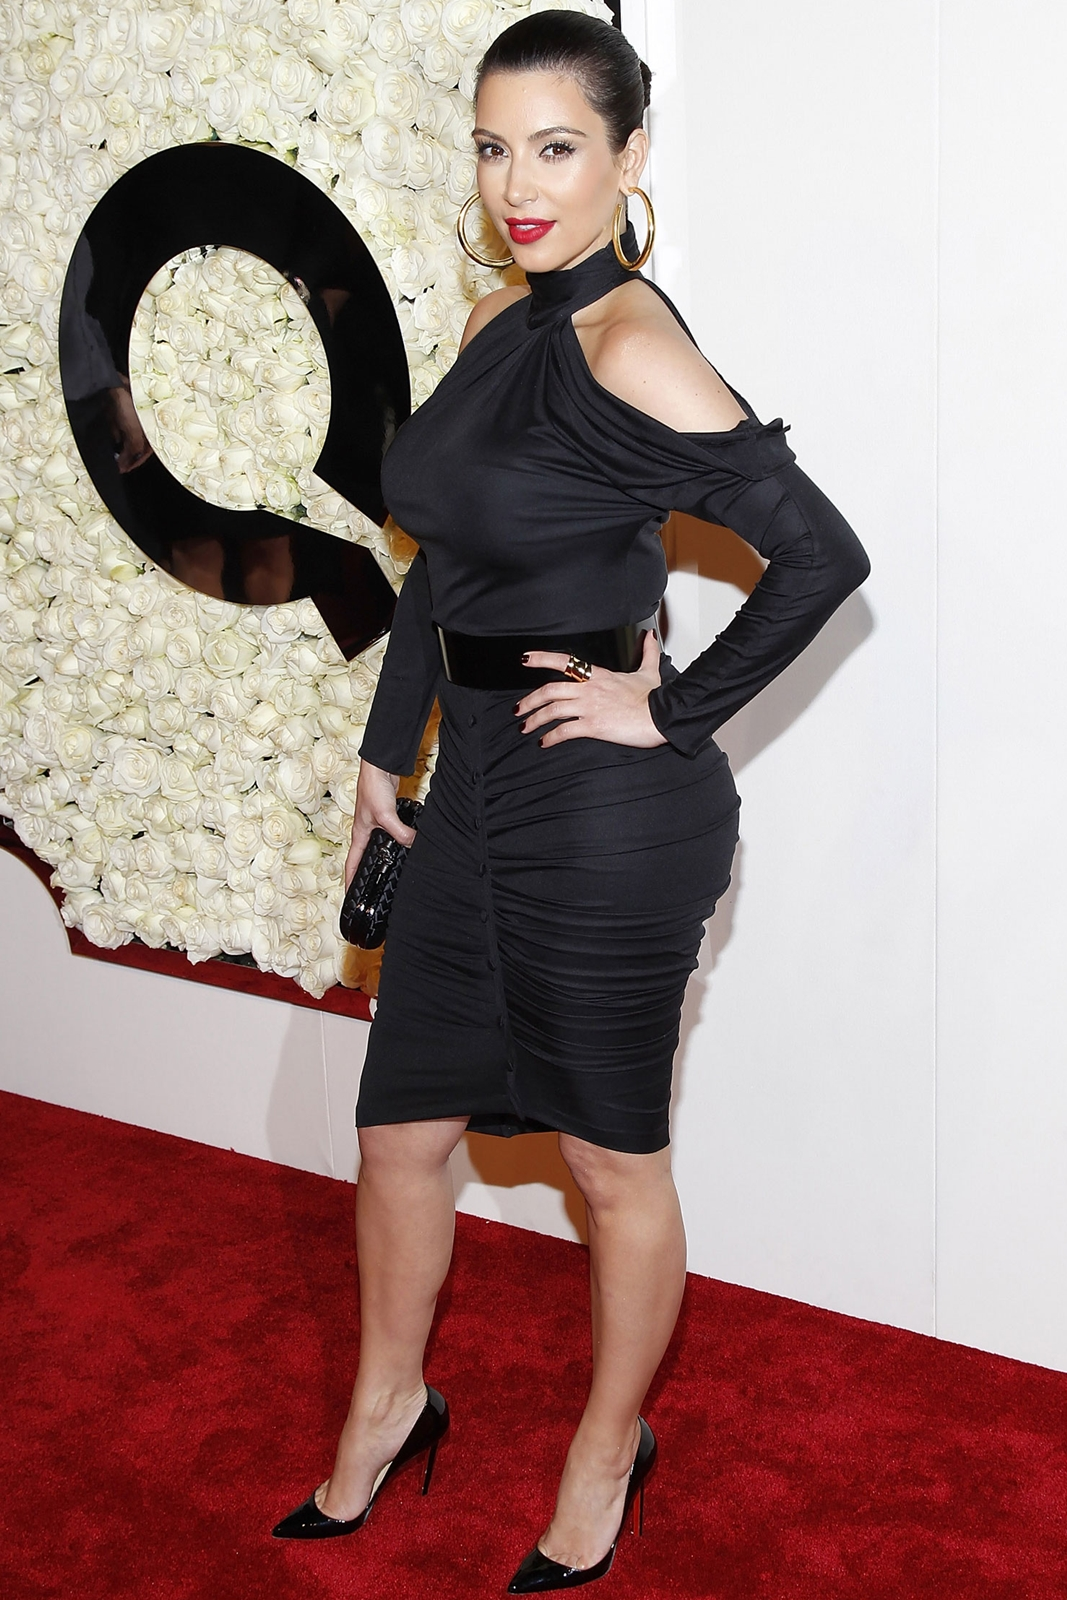 http://1.bp.blogspot.com/-axKO9LUsQfQ/T2hrPpbUkiI/AAAAAAAAMbQ/OwWzDZyIHs0/s1600/sploogeblog_kim_kardashian_littleblackdess_03%2B-%2BCopy.jpg